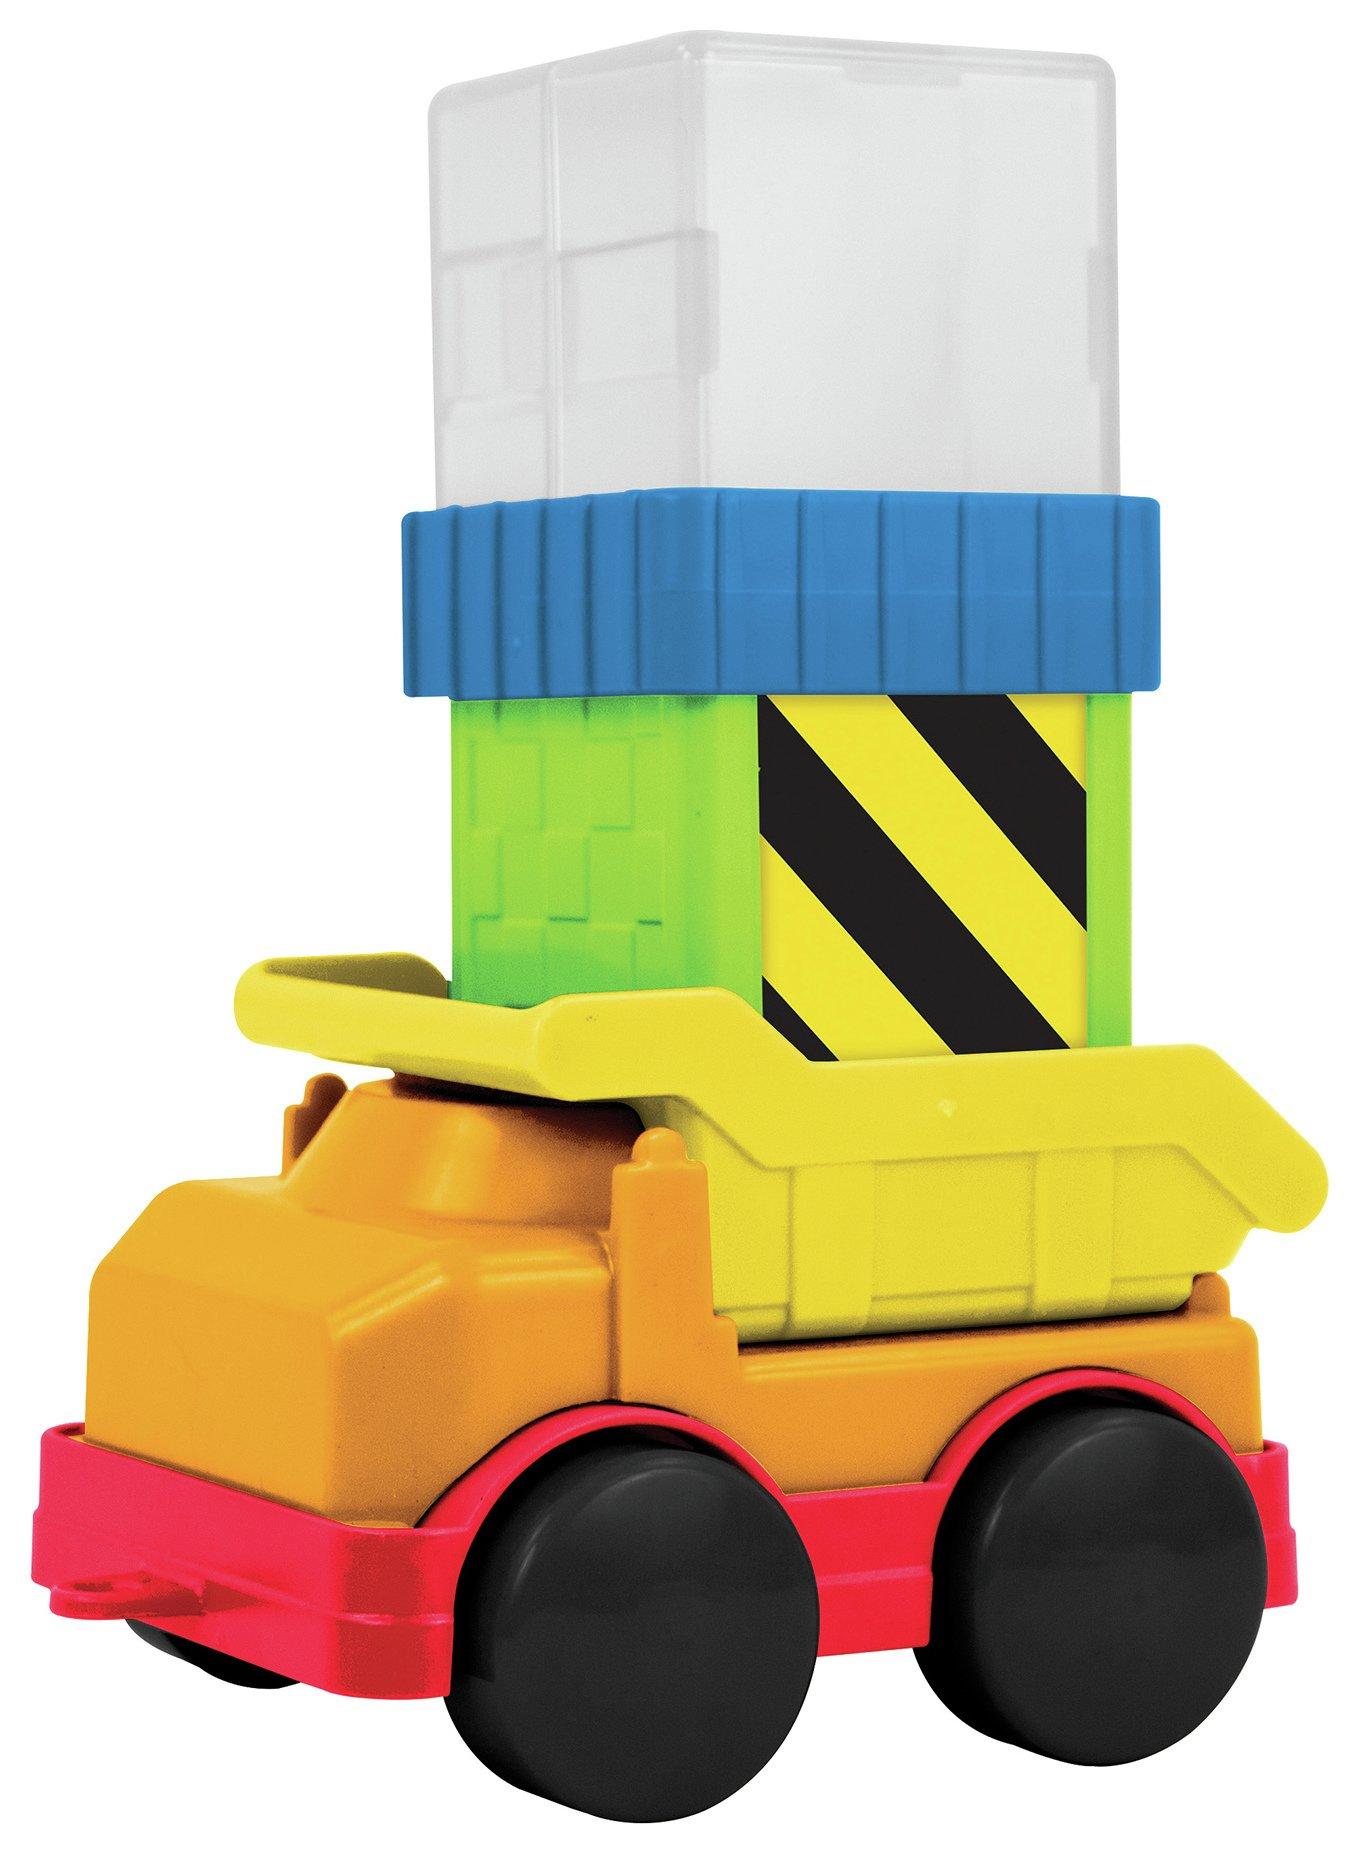 Sassy Silly Sensory Blocks Collection - Vehicle Set.